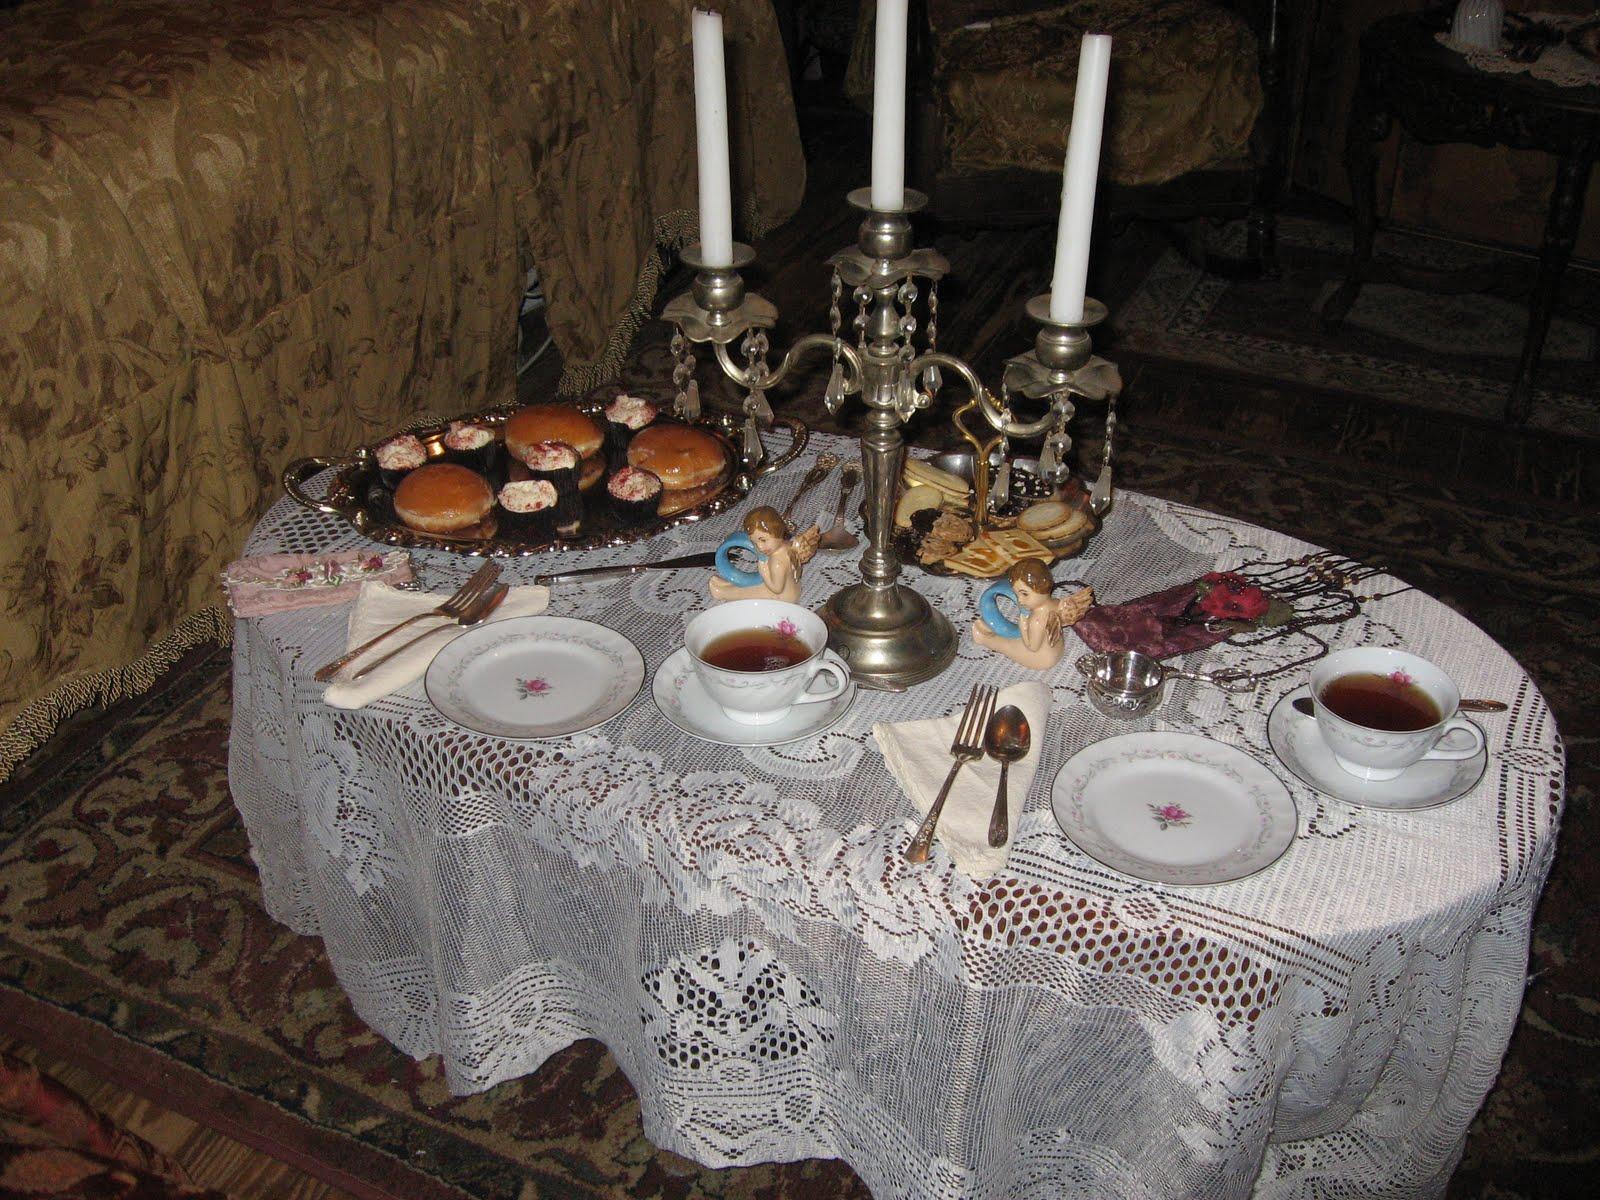 http://2.bp.blogspot.com/_5DoXzNRAJMk/TP1yRJRARtI/AAAAAAAAEPM/Fb5qyGRuoDg/s1600/Victorian+Tea+Silver+parlor+019.JPG